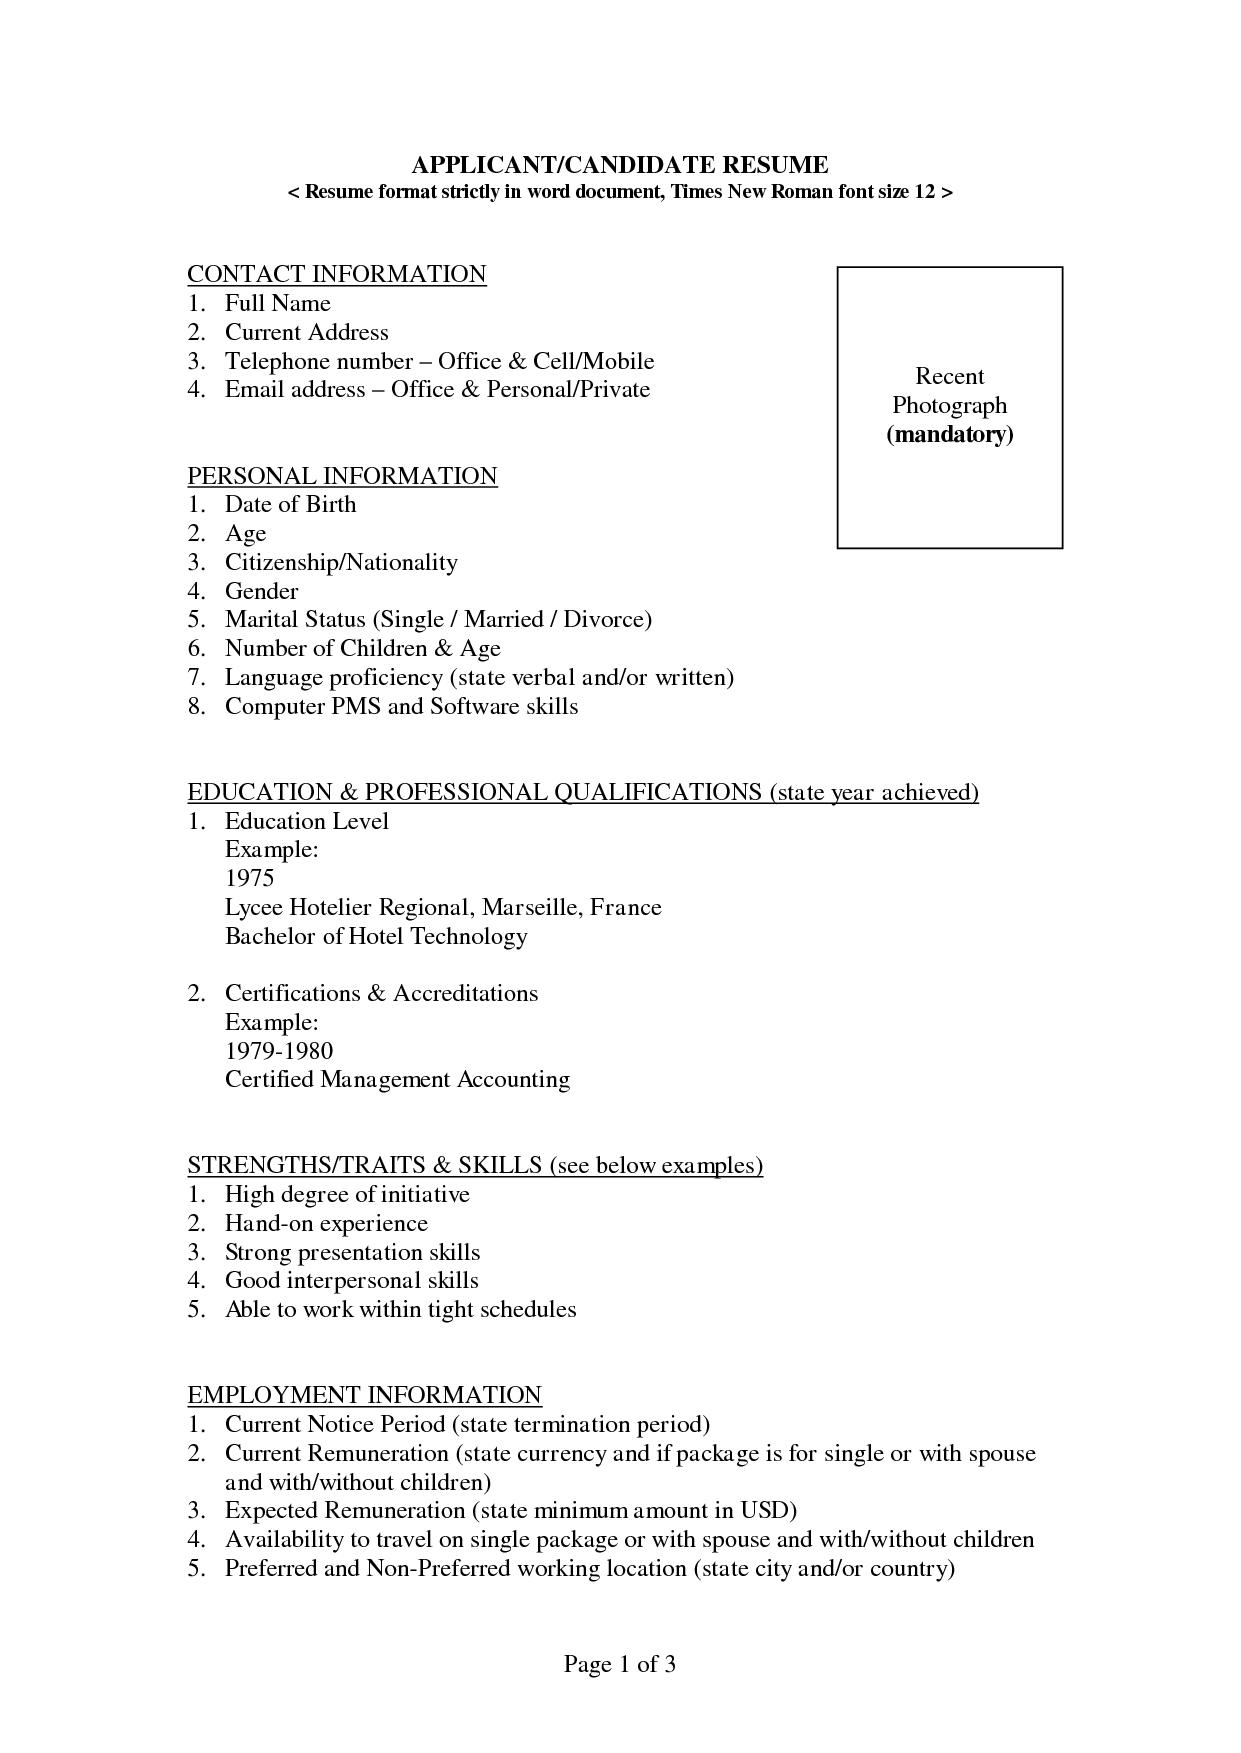 canadian resume sample format